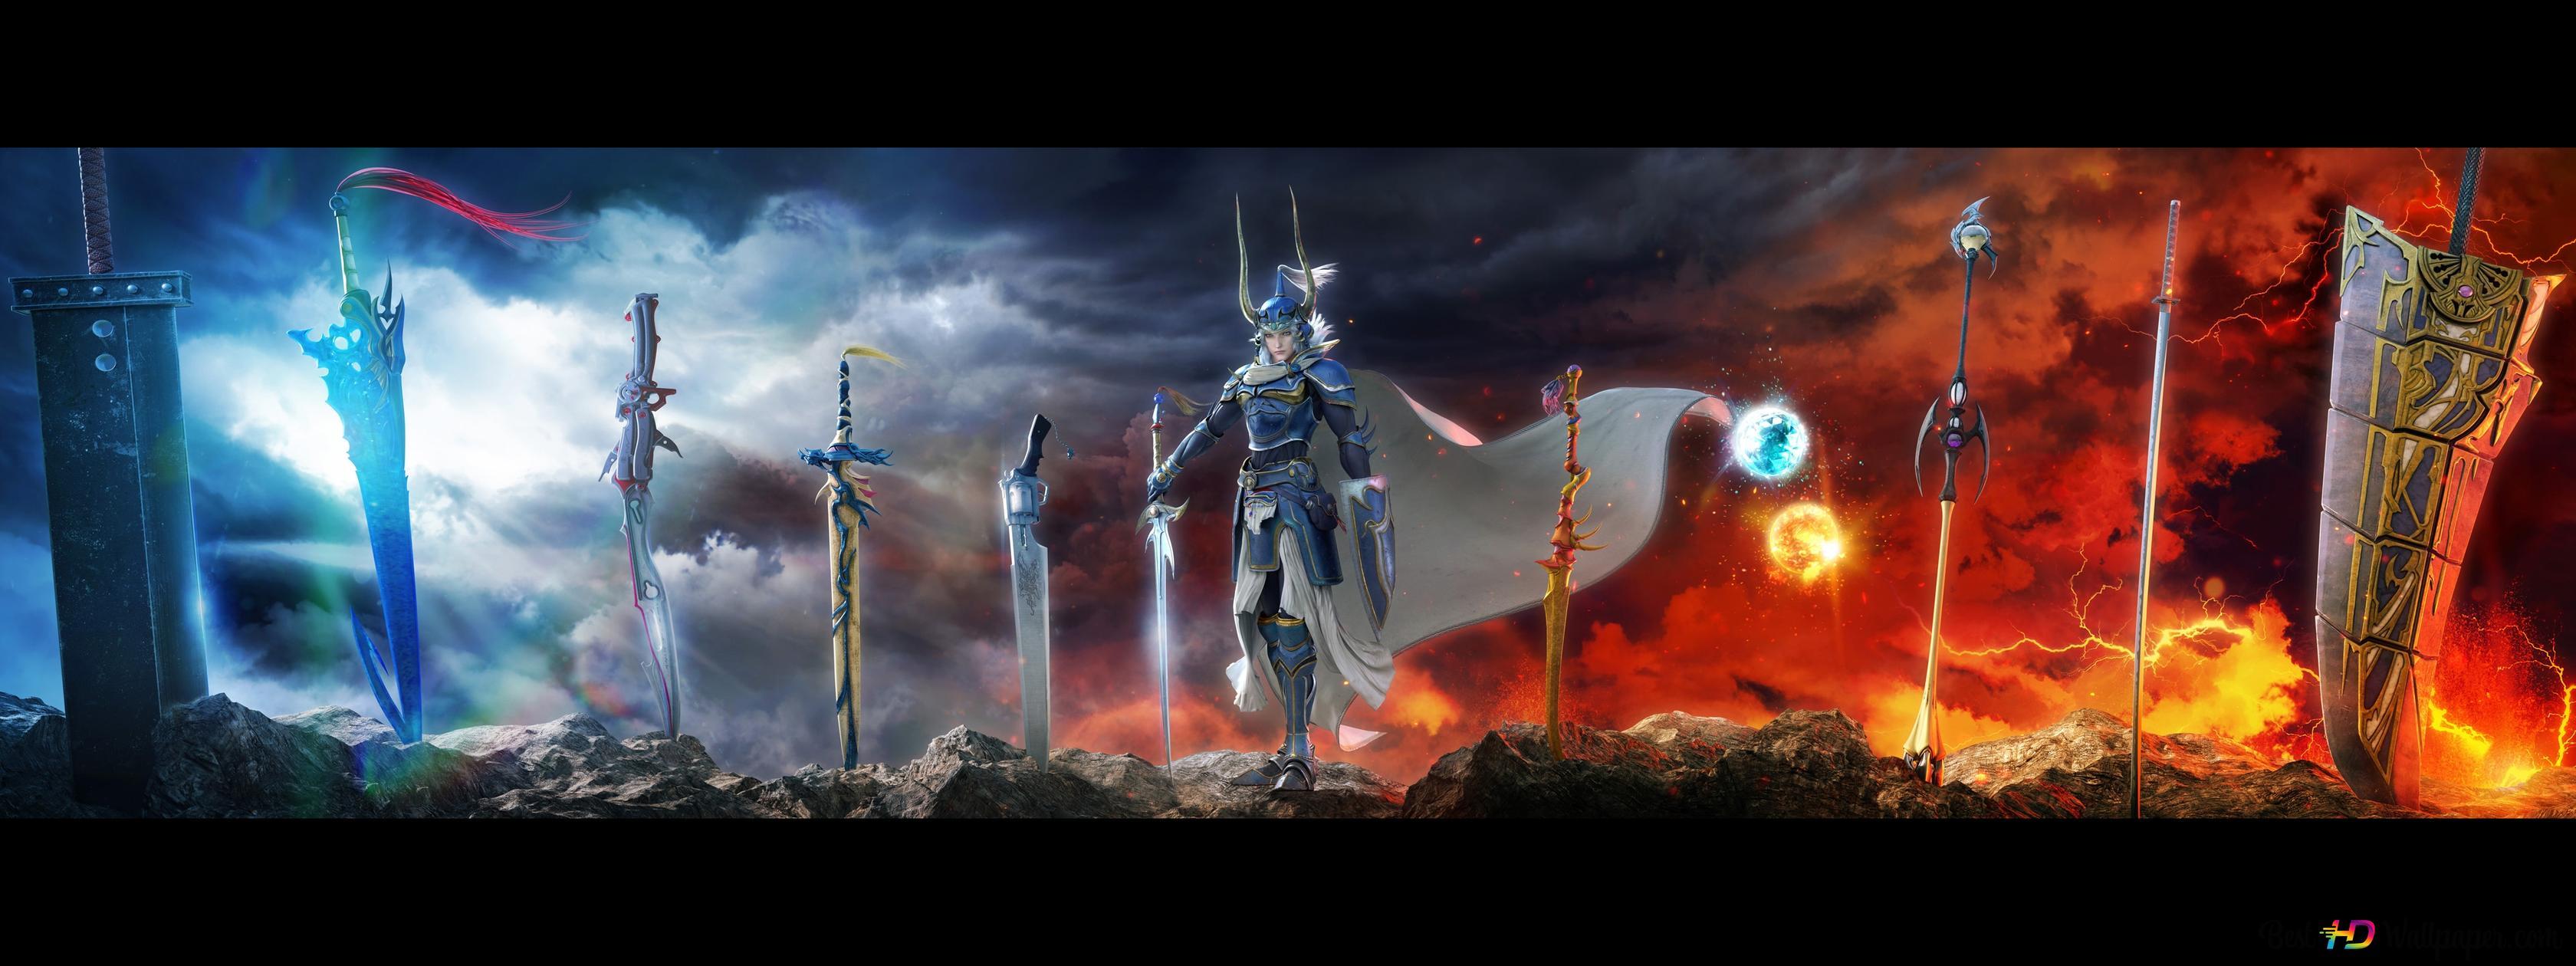 Final Fantasy Dissidia Nt Warrior Of Light Hd Wallpaper Download